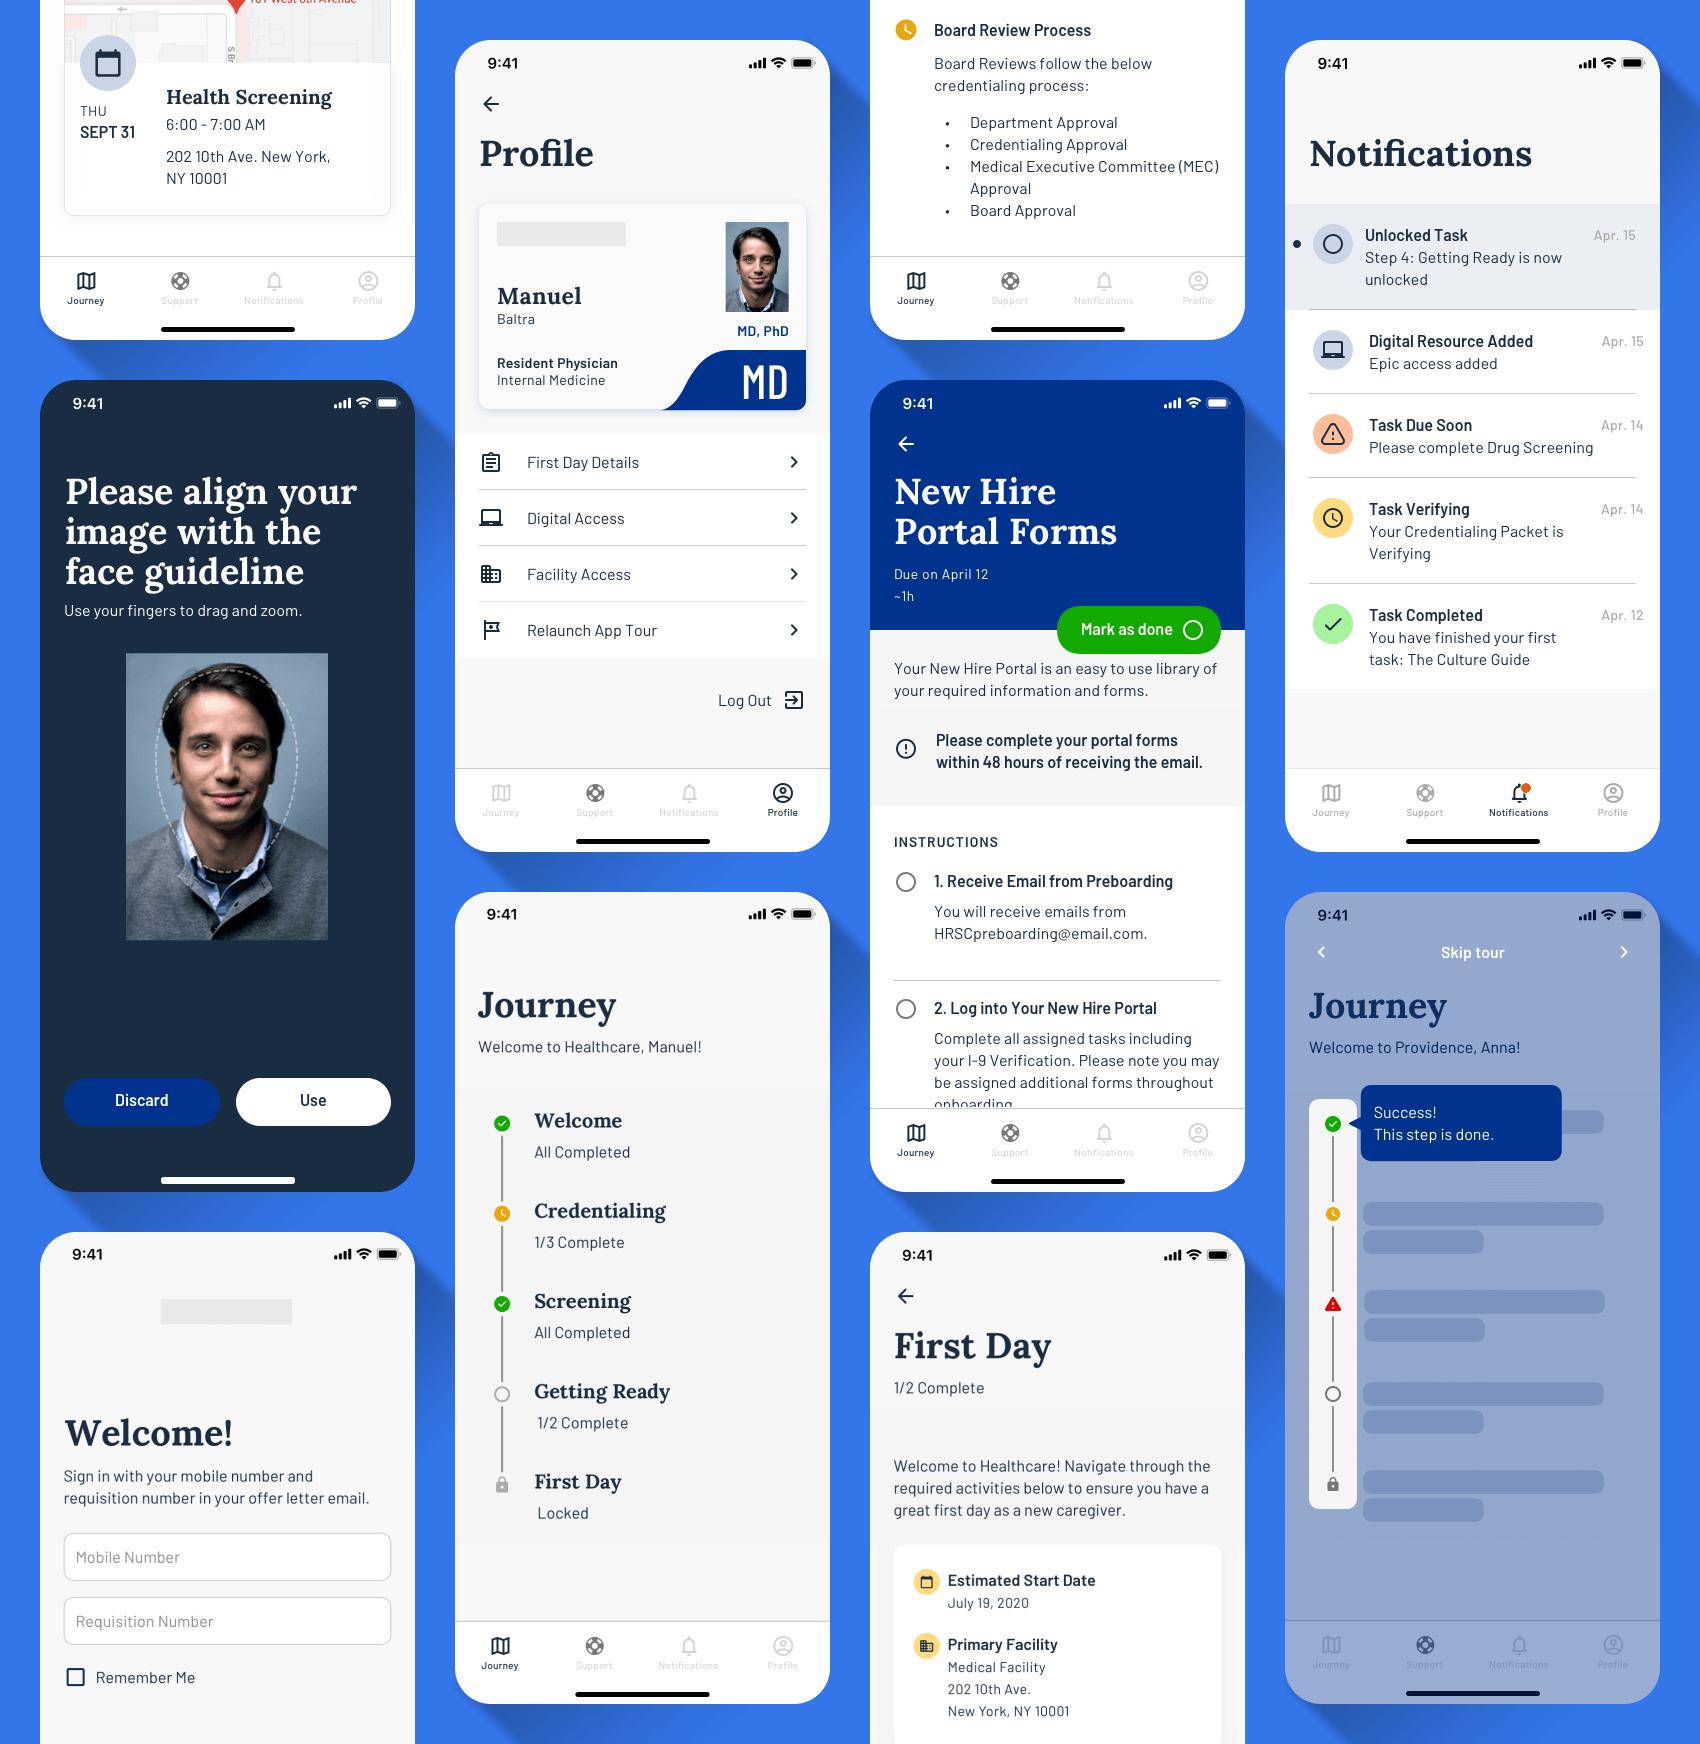 OnBoardMe-App-1-1